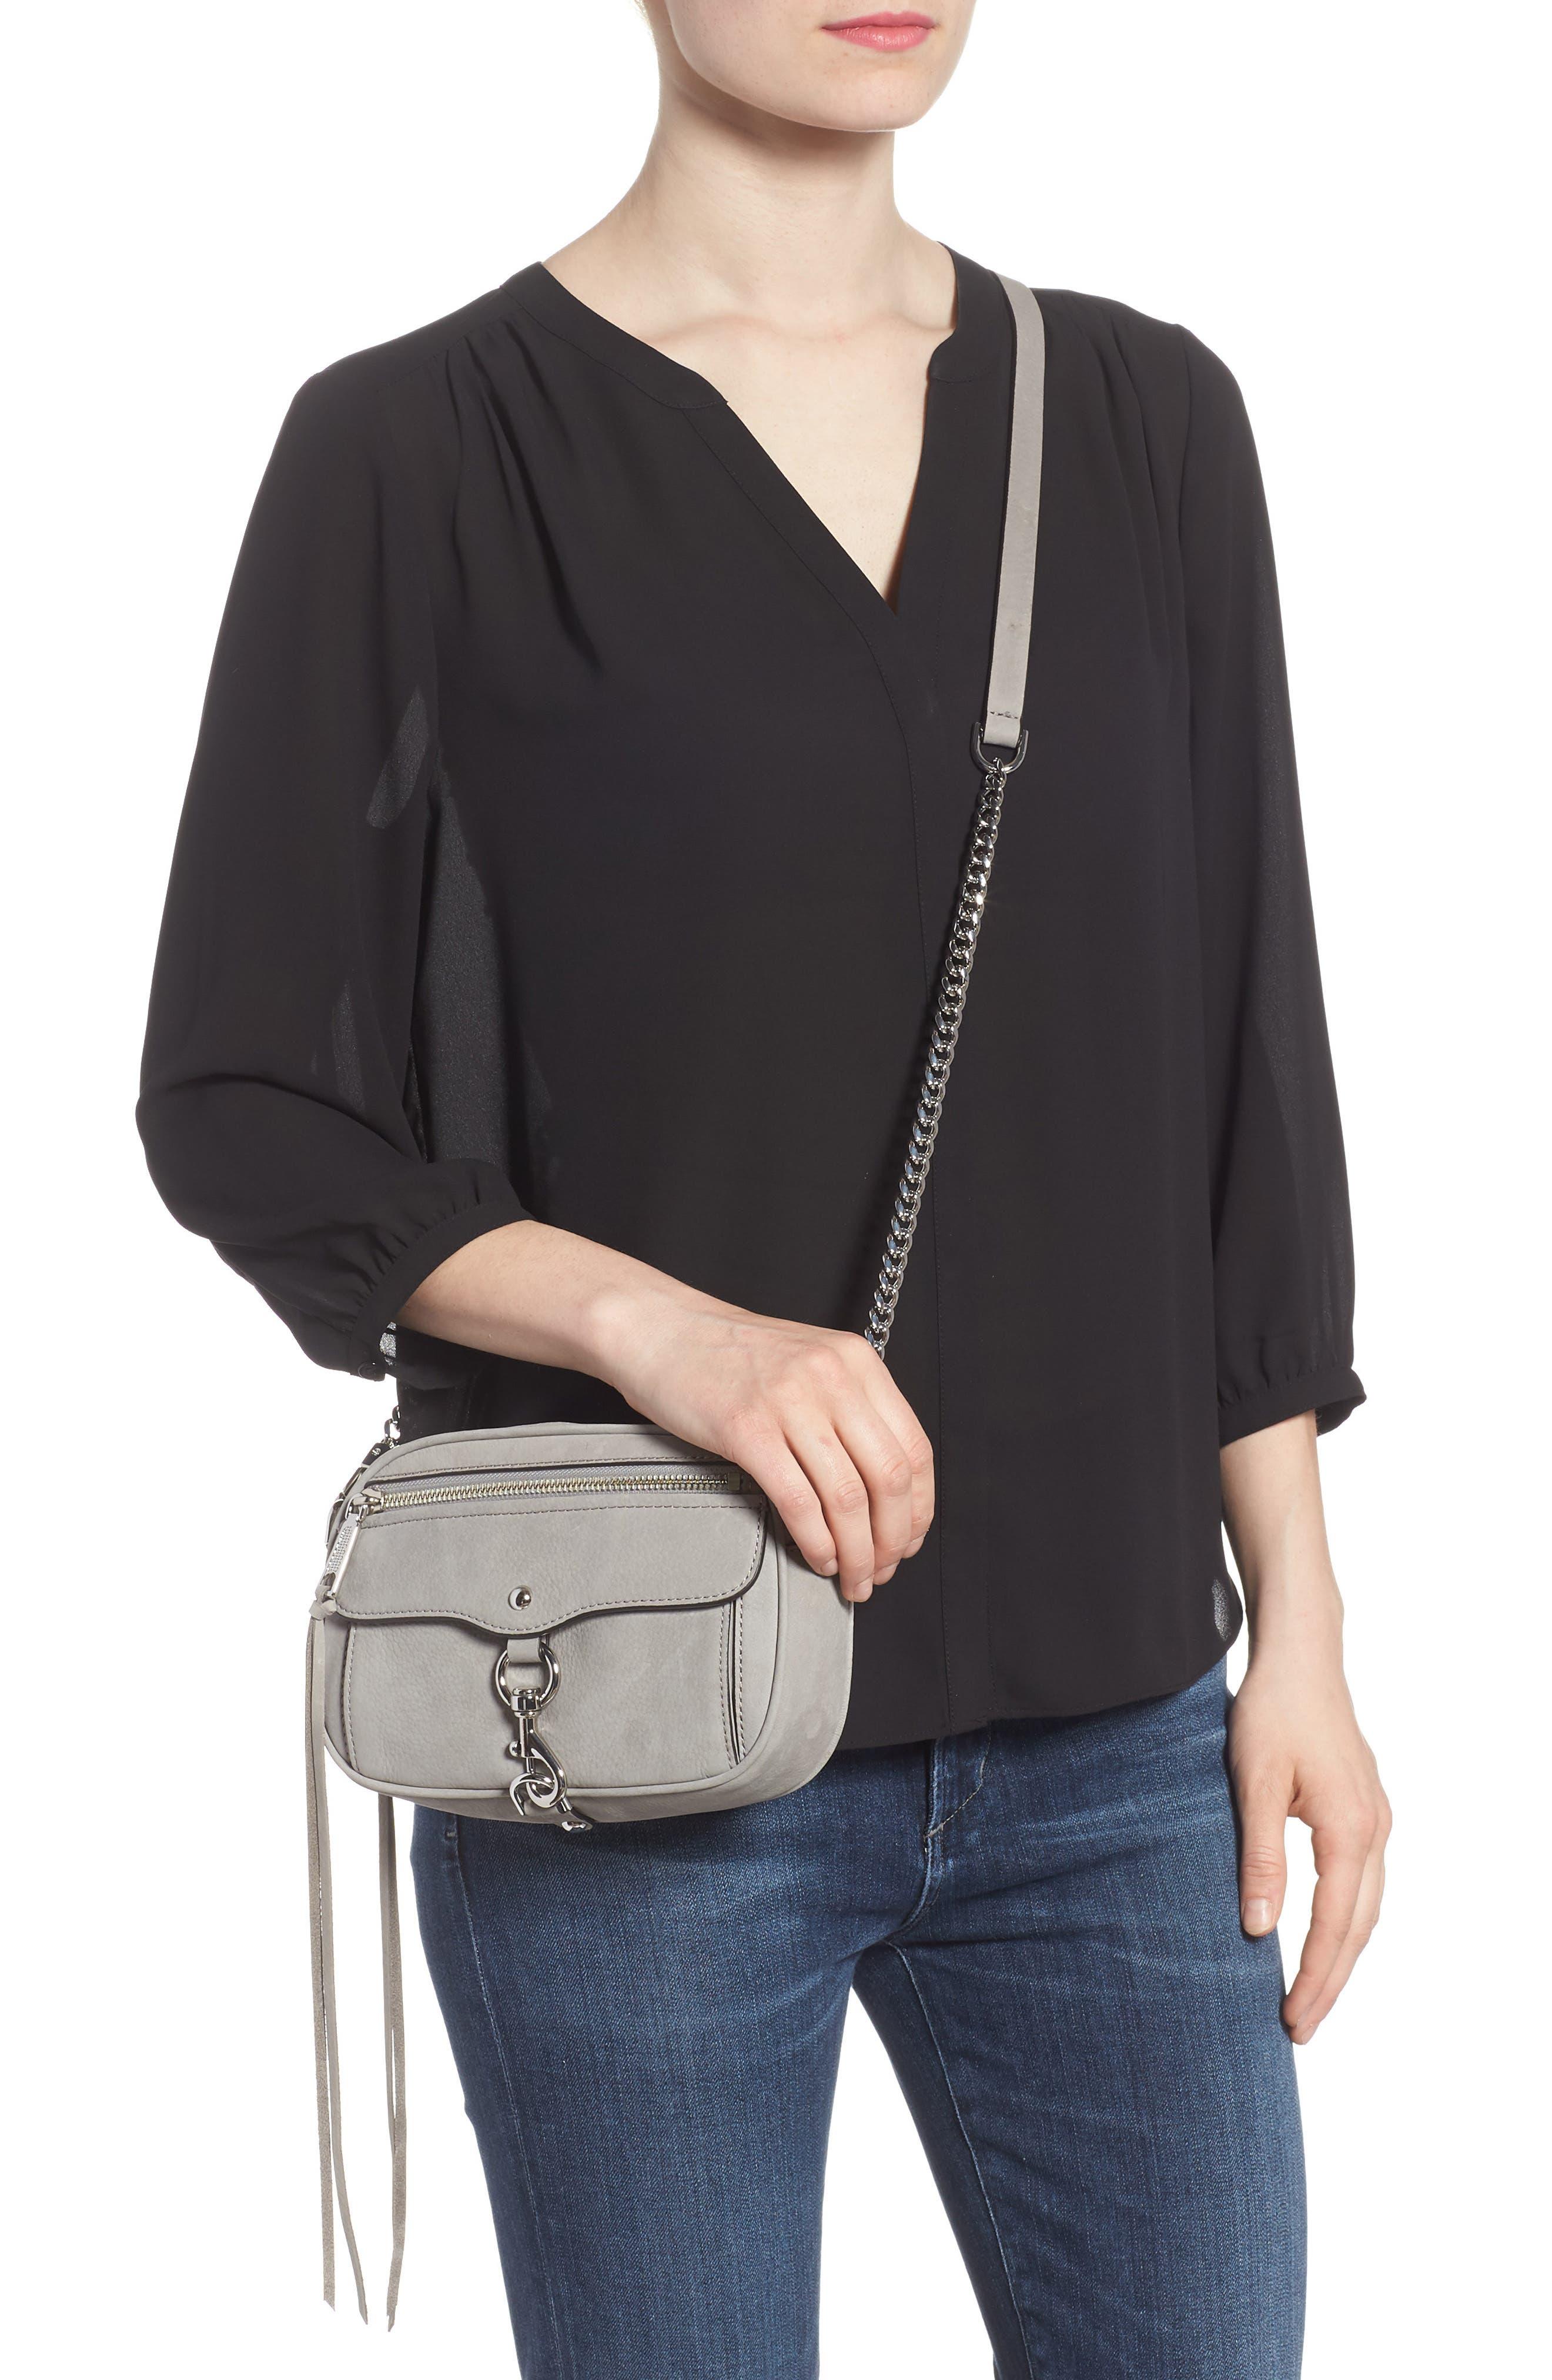 REBECCA MINKOFF,                             Blythe Leather Crossbody Bag,                             Alternate thumbnail 2, color,                             020